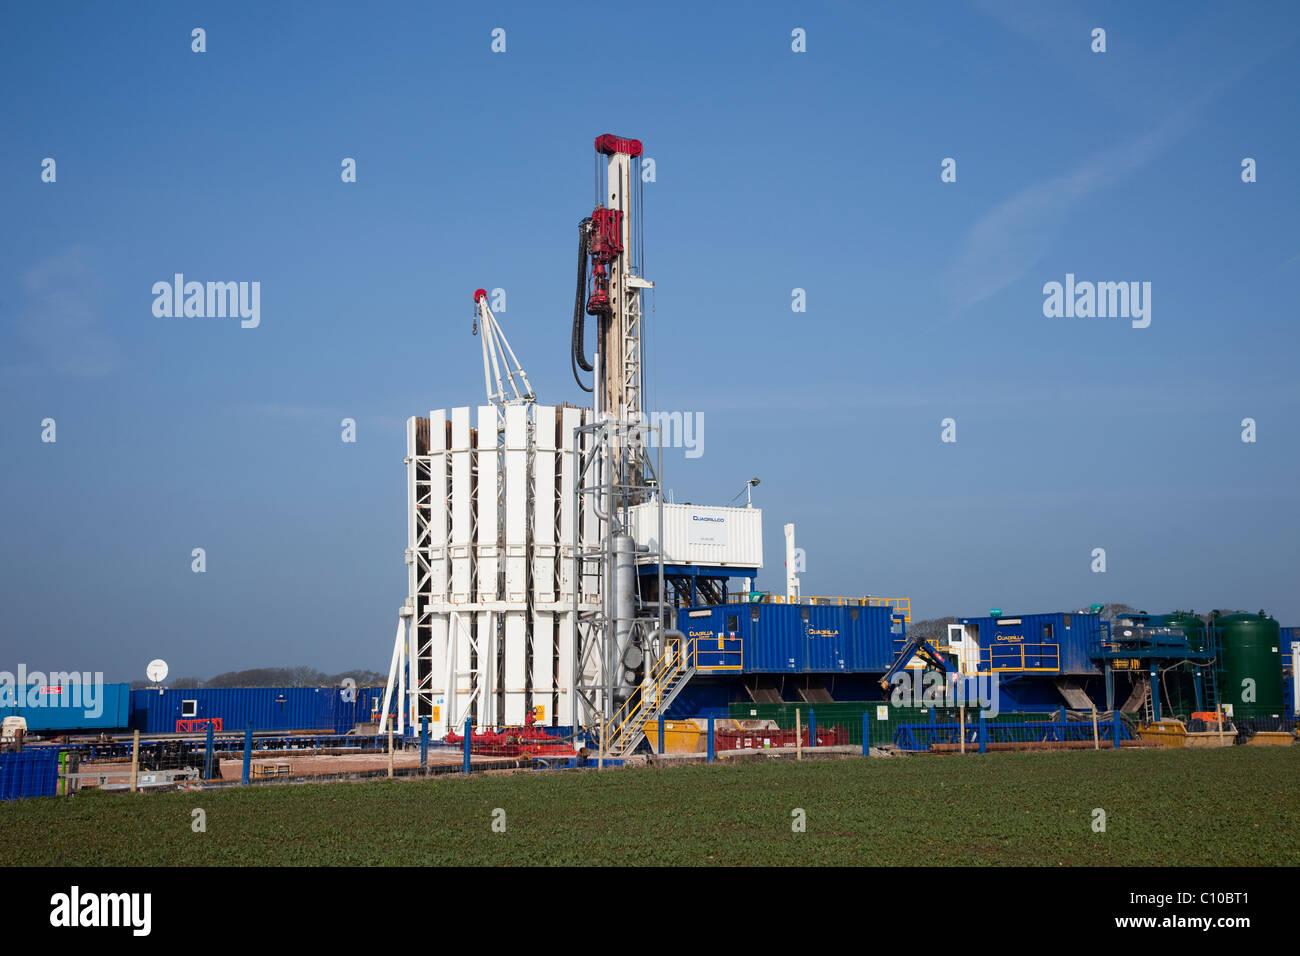 Rig Danger _Cuadrilla Resources rig in Grange Hill, Poulton Le Fylde, Blackpool, England, UK - Stock Image